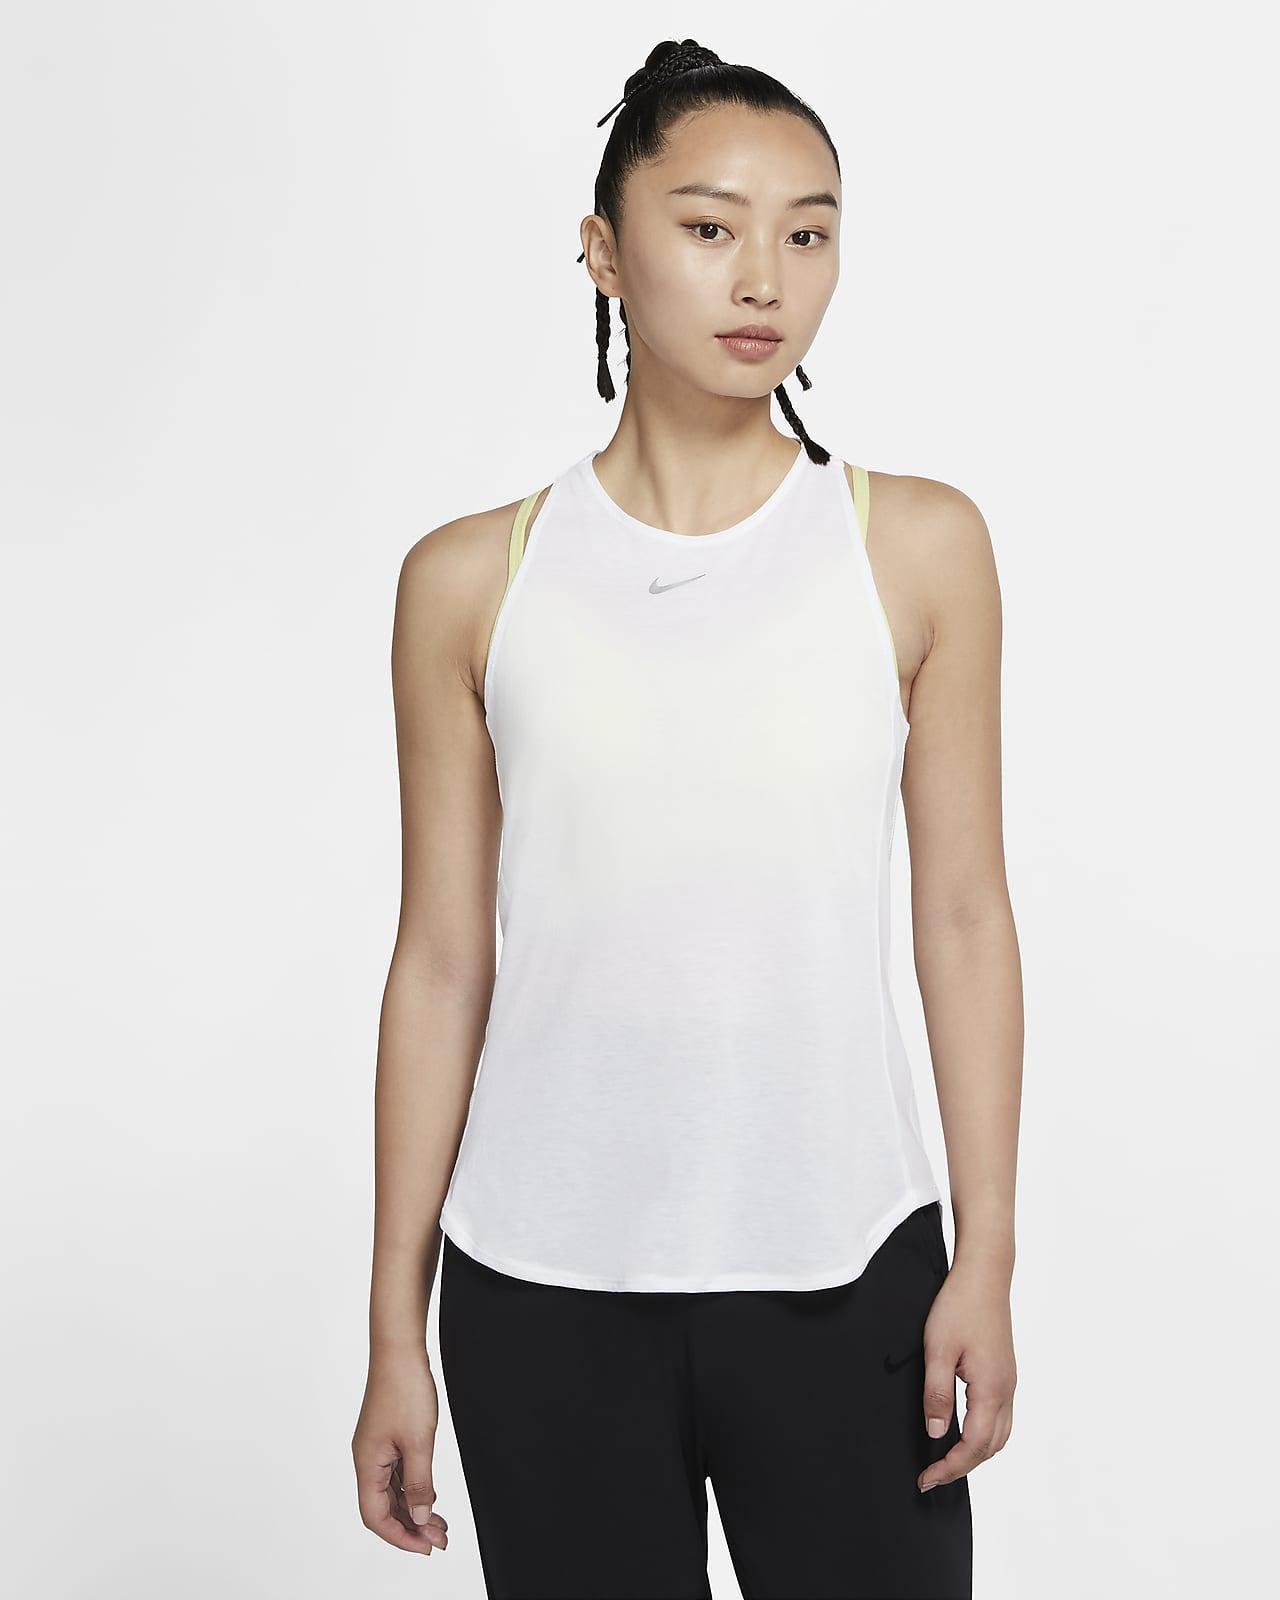 Nike Pro AeroAdapt Women's Tank